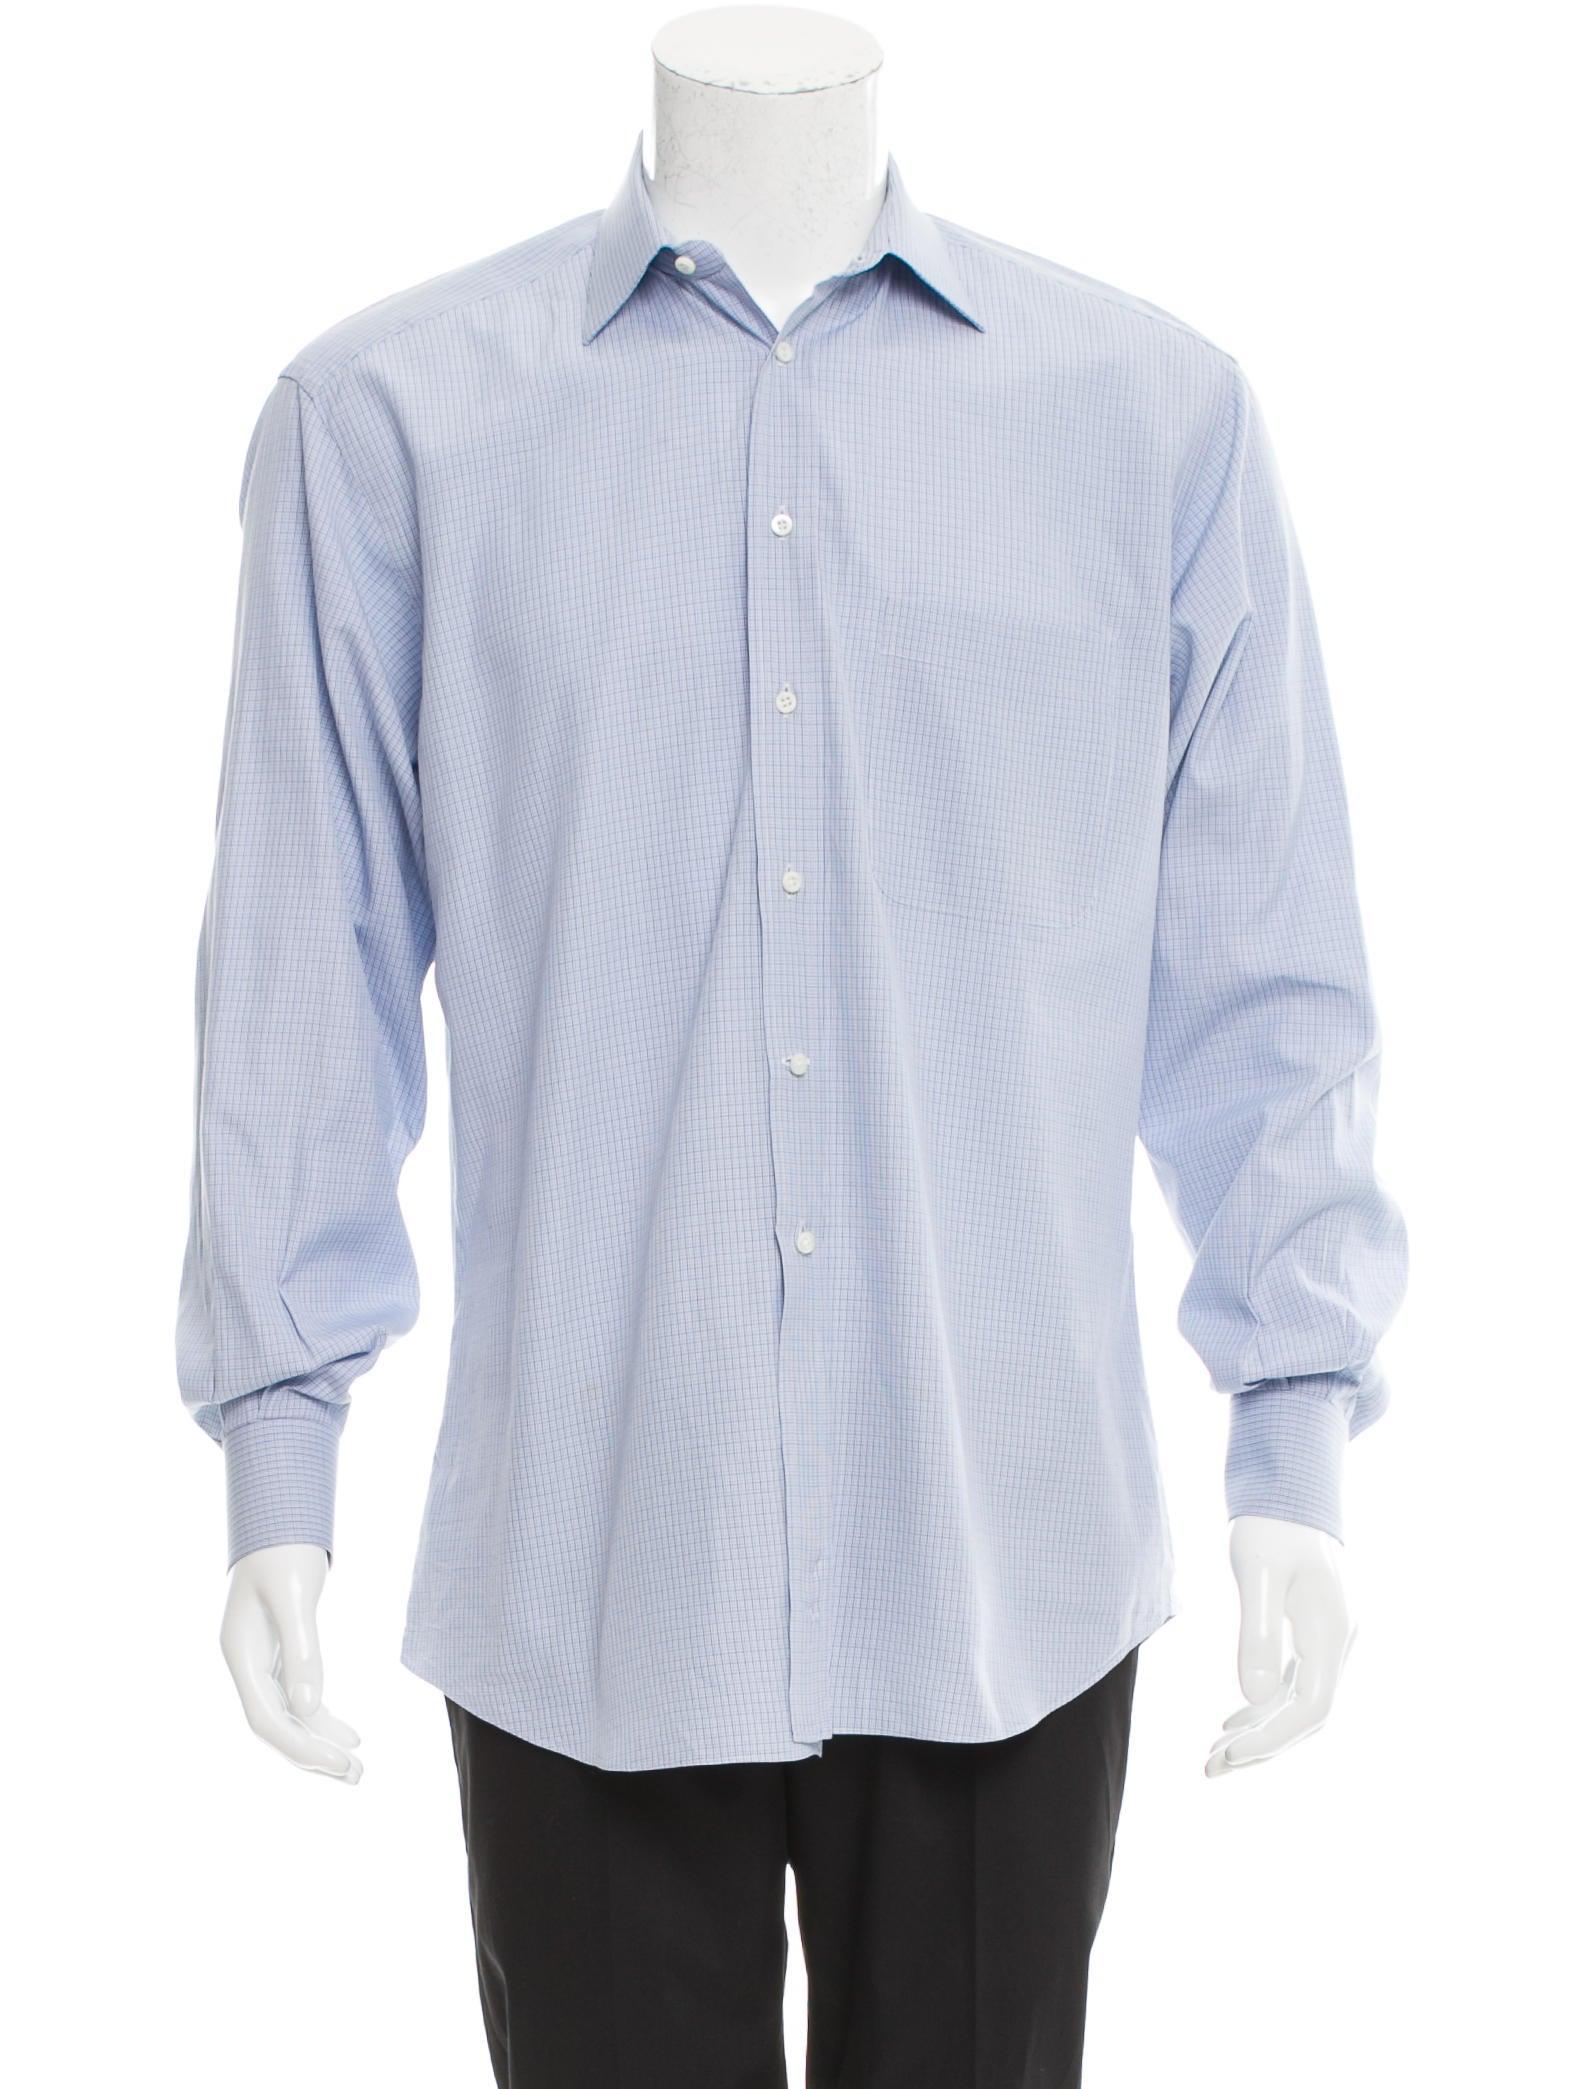 ermenegildo zegna plaid button up shirt clothing zgn24243 the realreal. Black Bedroom Furniture Sets. Home Design Ideas